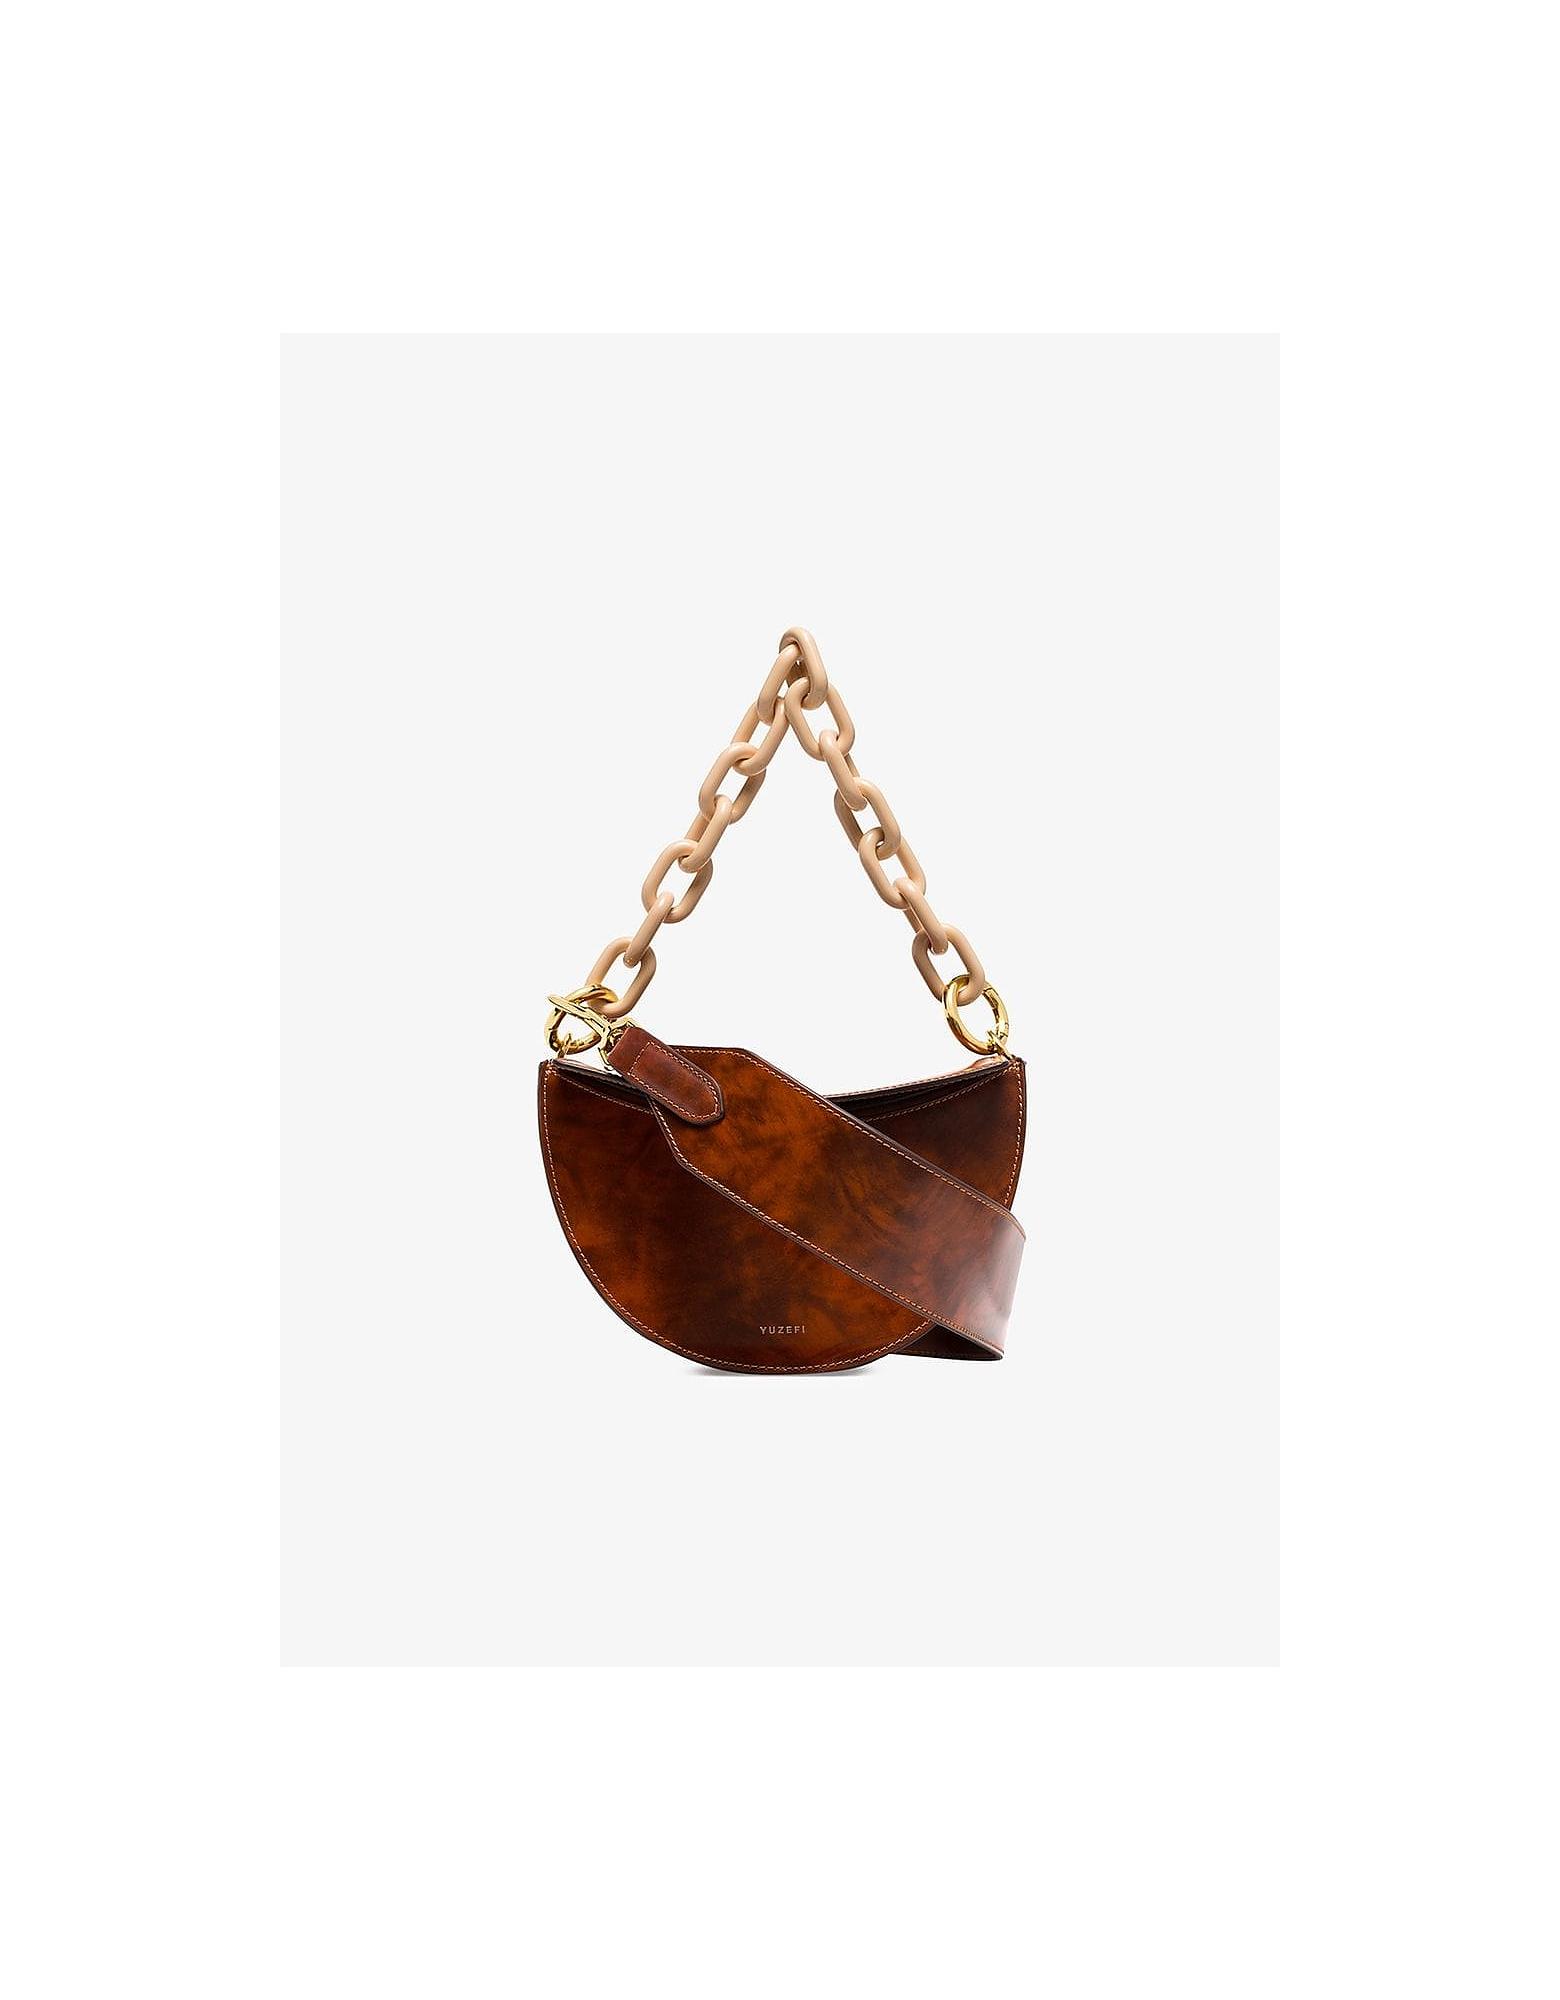 Yuzefi Designer Handbags, Brown Doris Marble Effect Shoulder Bag